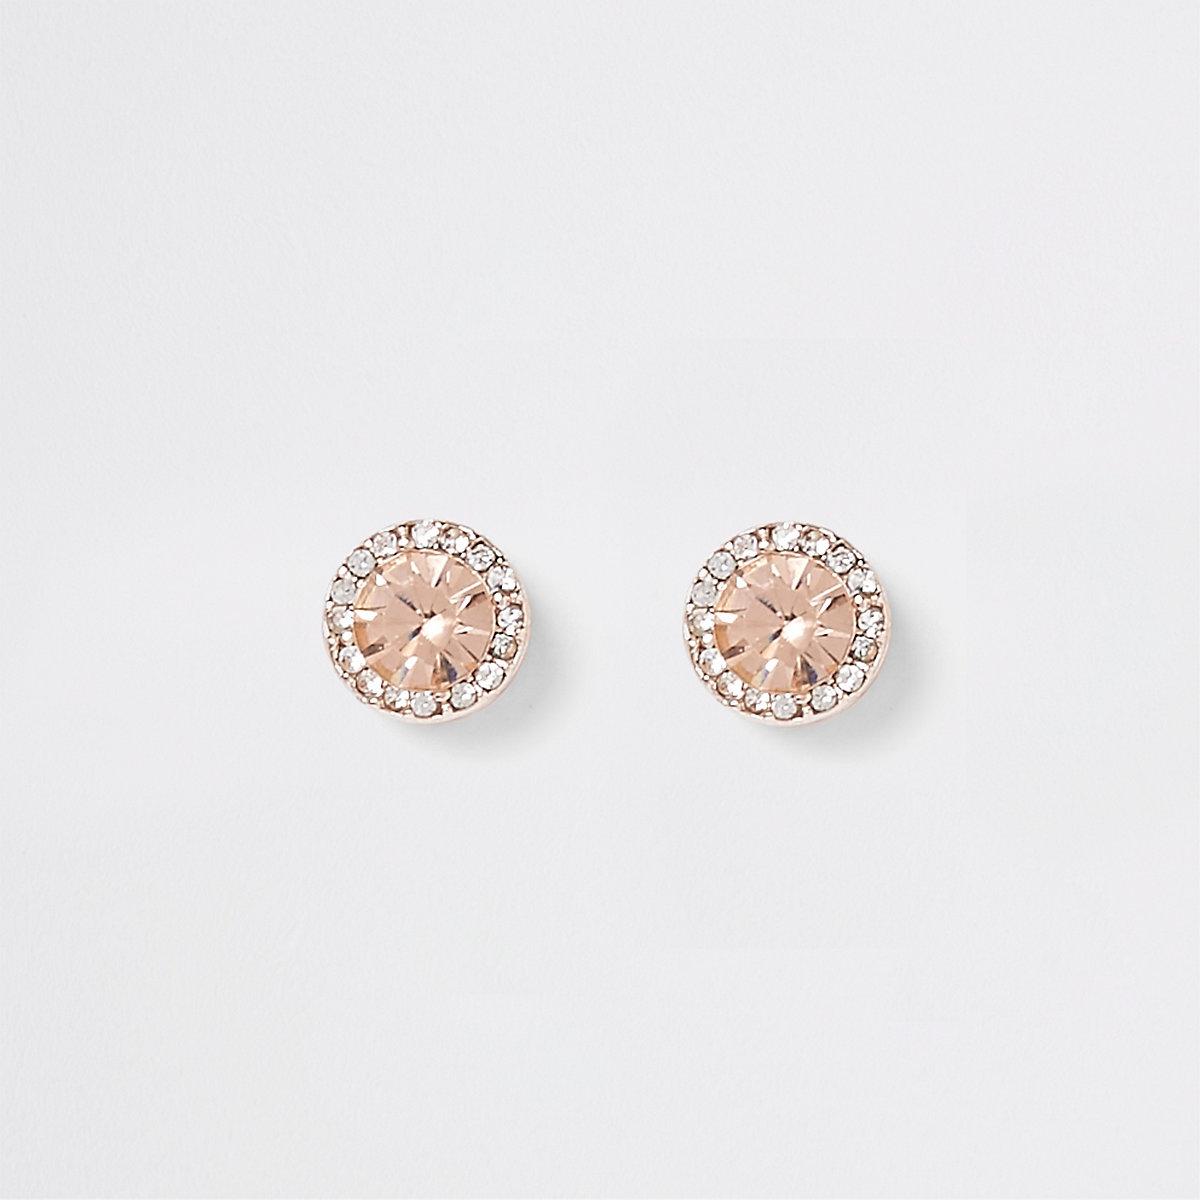 Rose gold tone diamante stone earrings